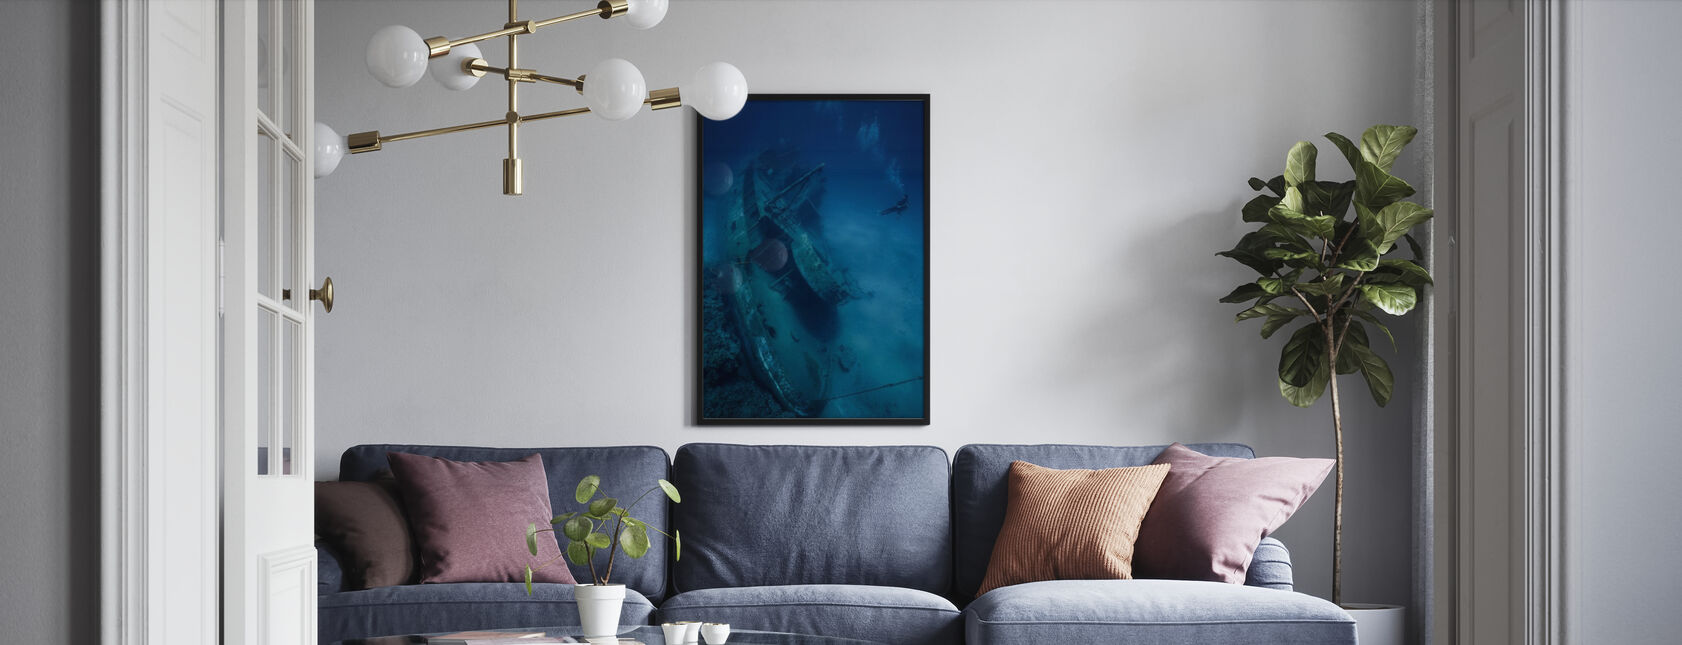 Shipwreck and Diver - Framed print - Living Room